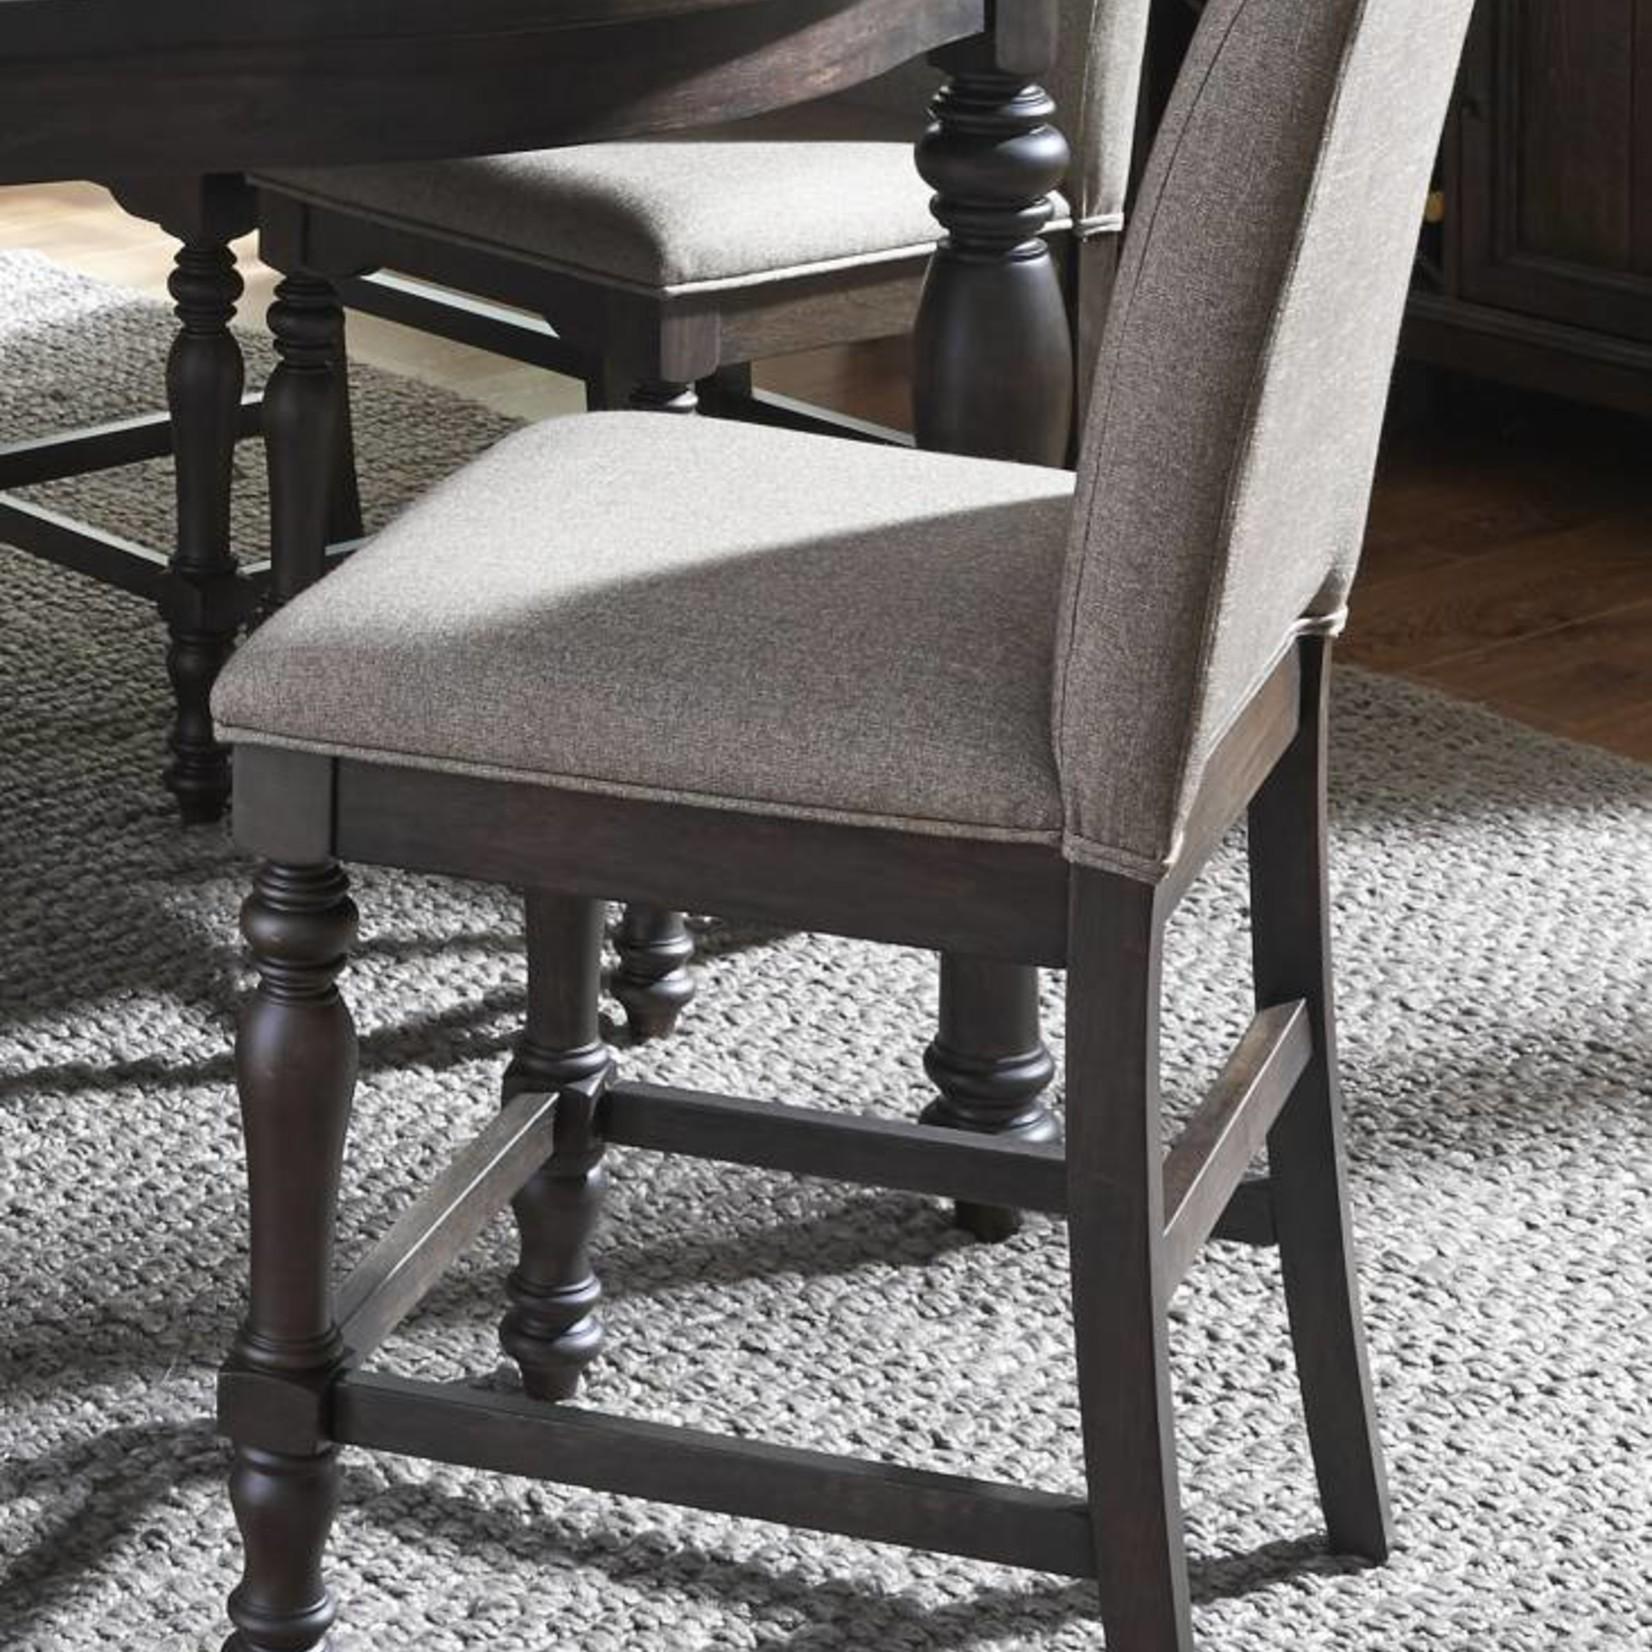 Catawba Hills Uph Counter Height Chair 816-B650124